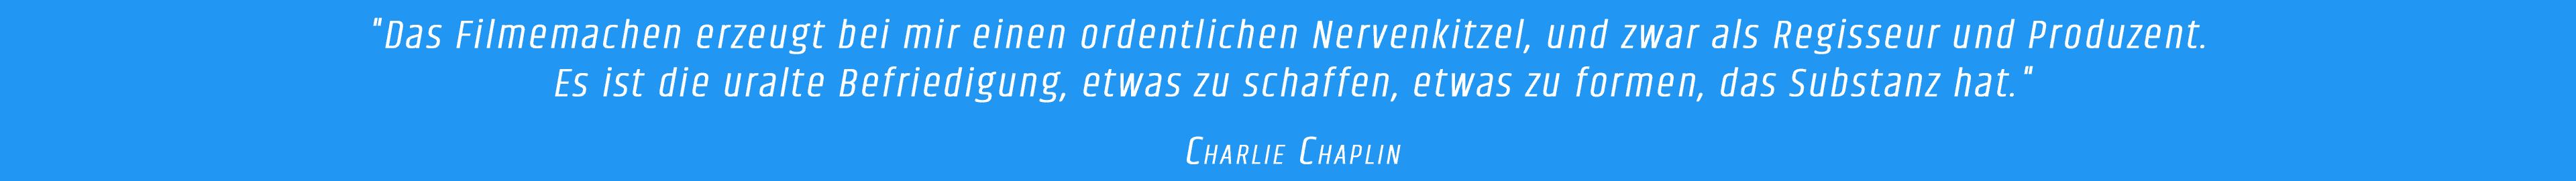 Zitat - Charlie Chaplin